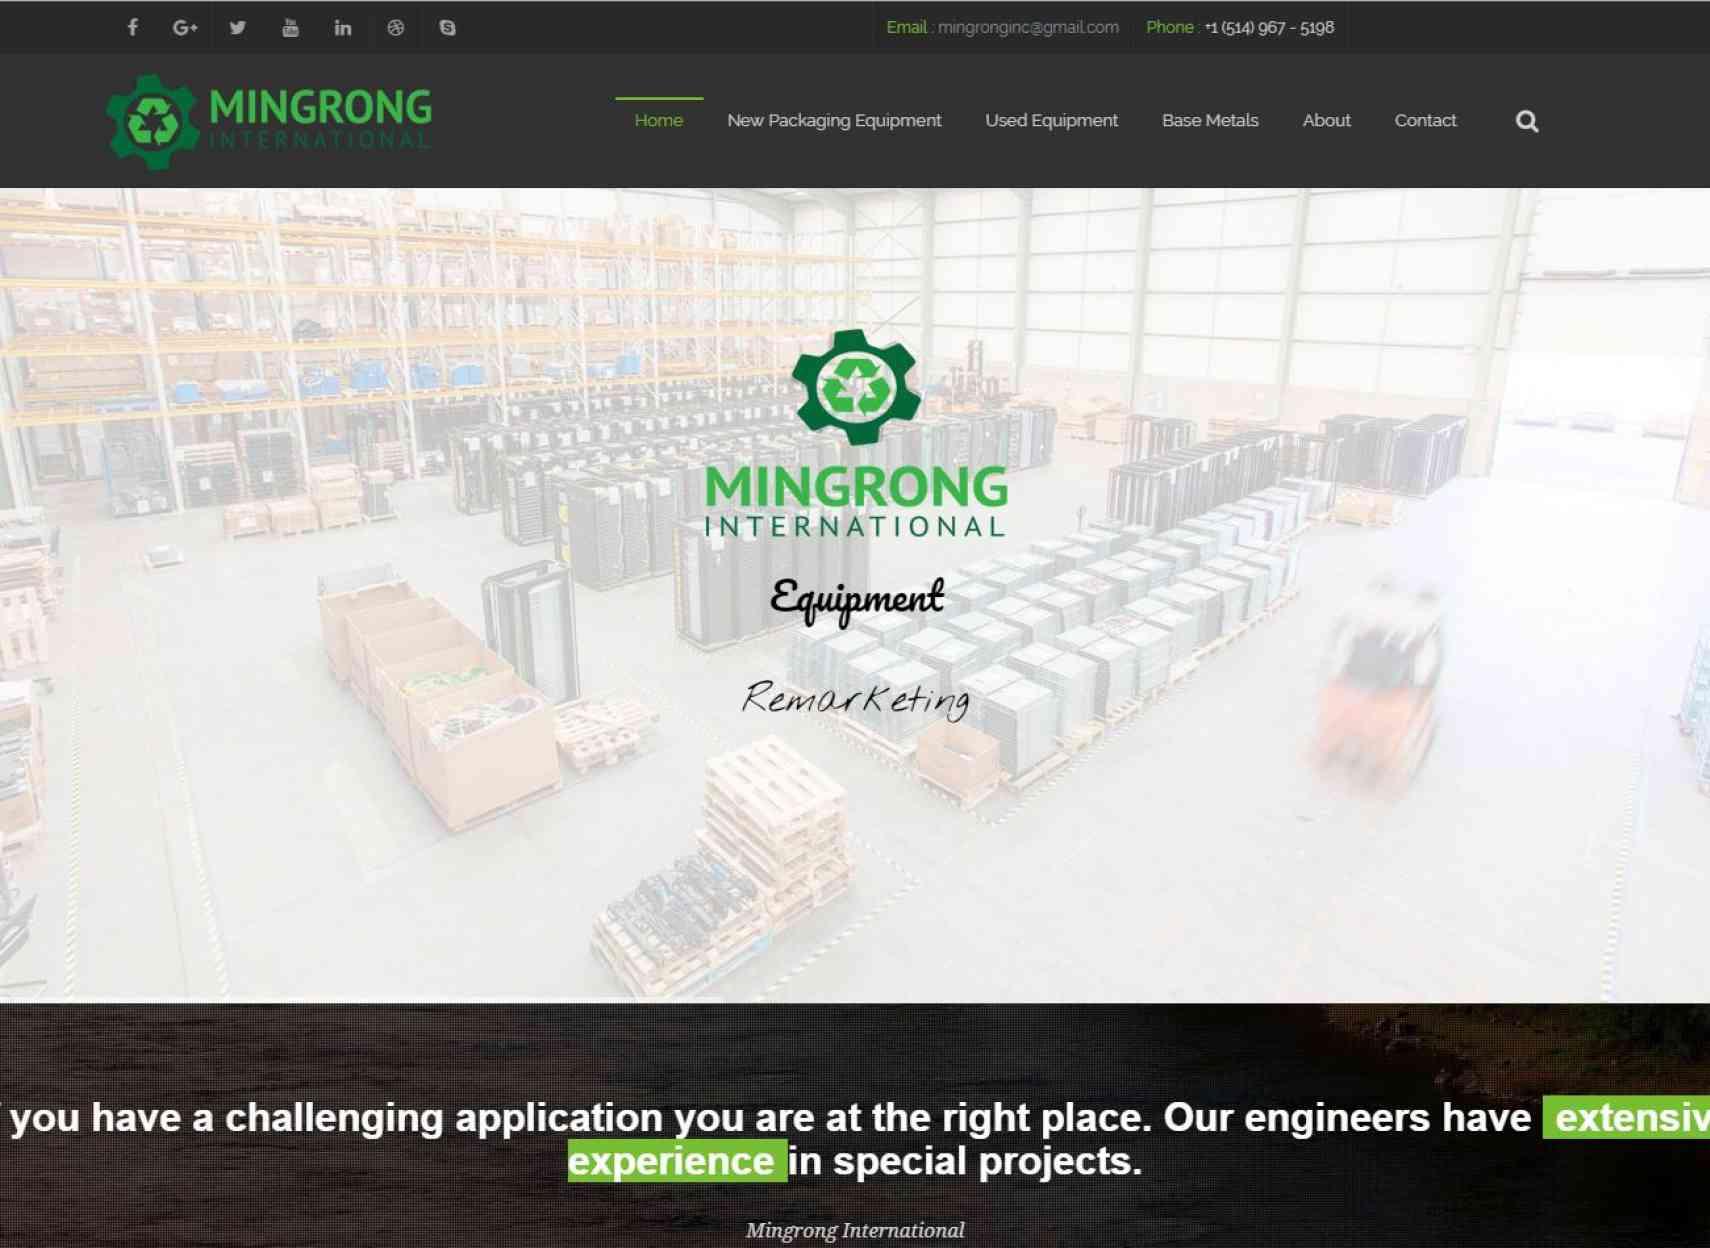 web design, web development, seo, search engine optimization